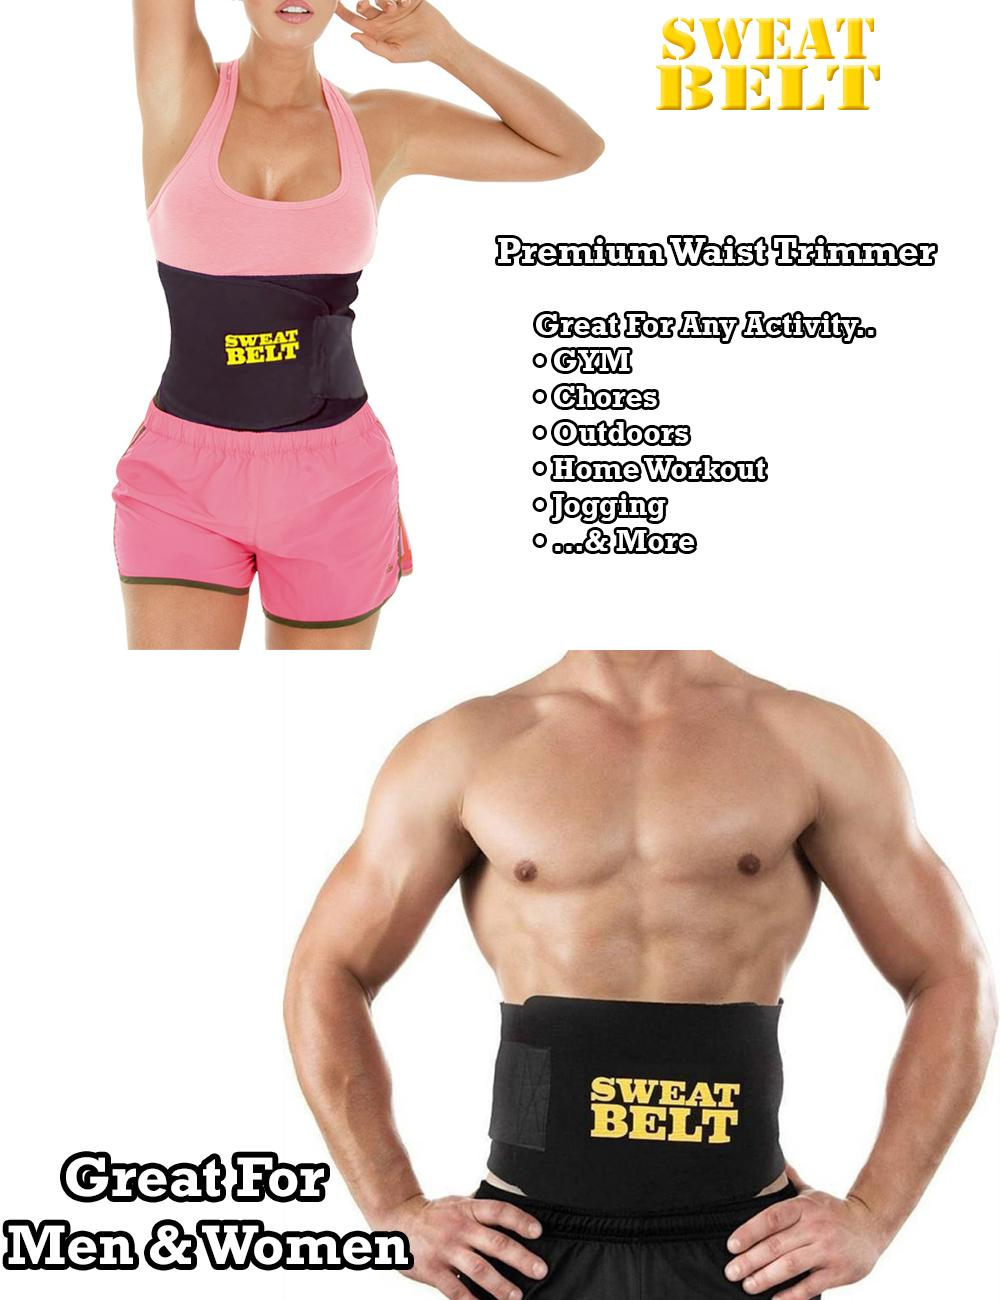 b1a6e271aa2 Specifications of SWEAT BELT Premium Waist Trimmer (Black)